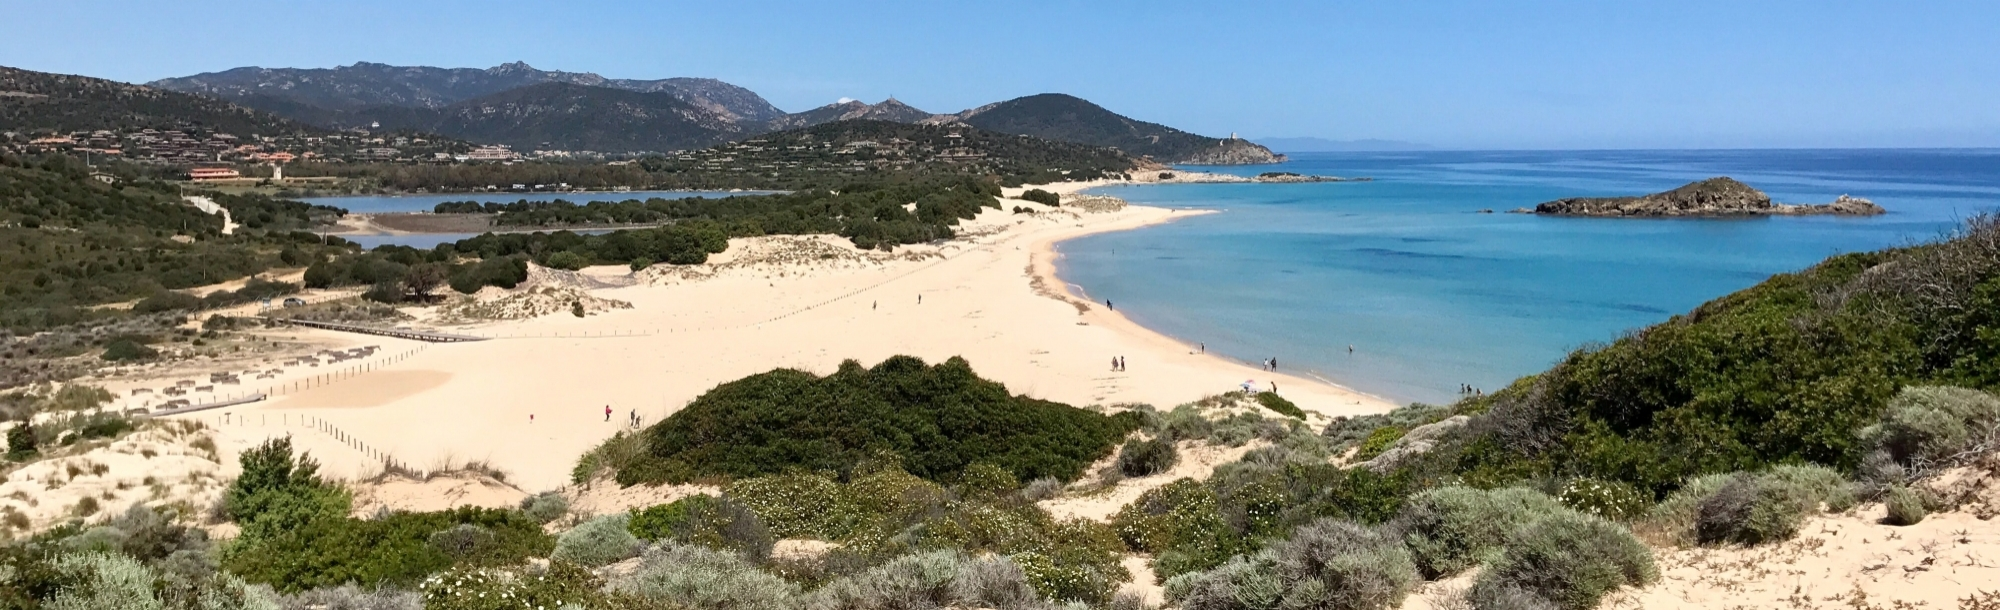 Spiaggia Sud Sardegna